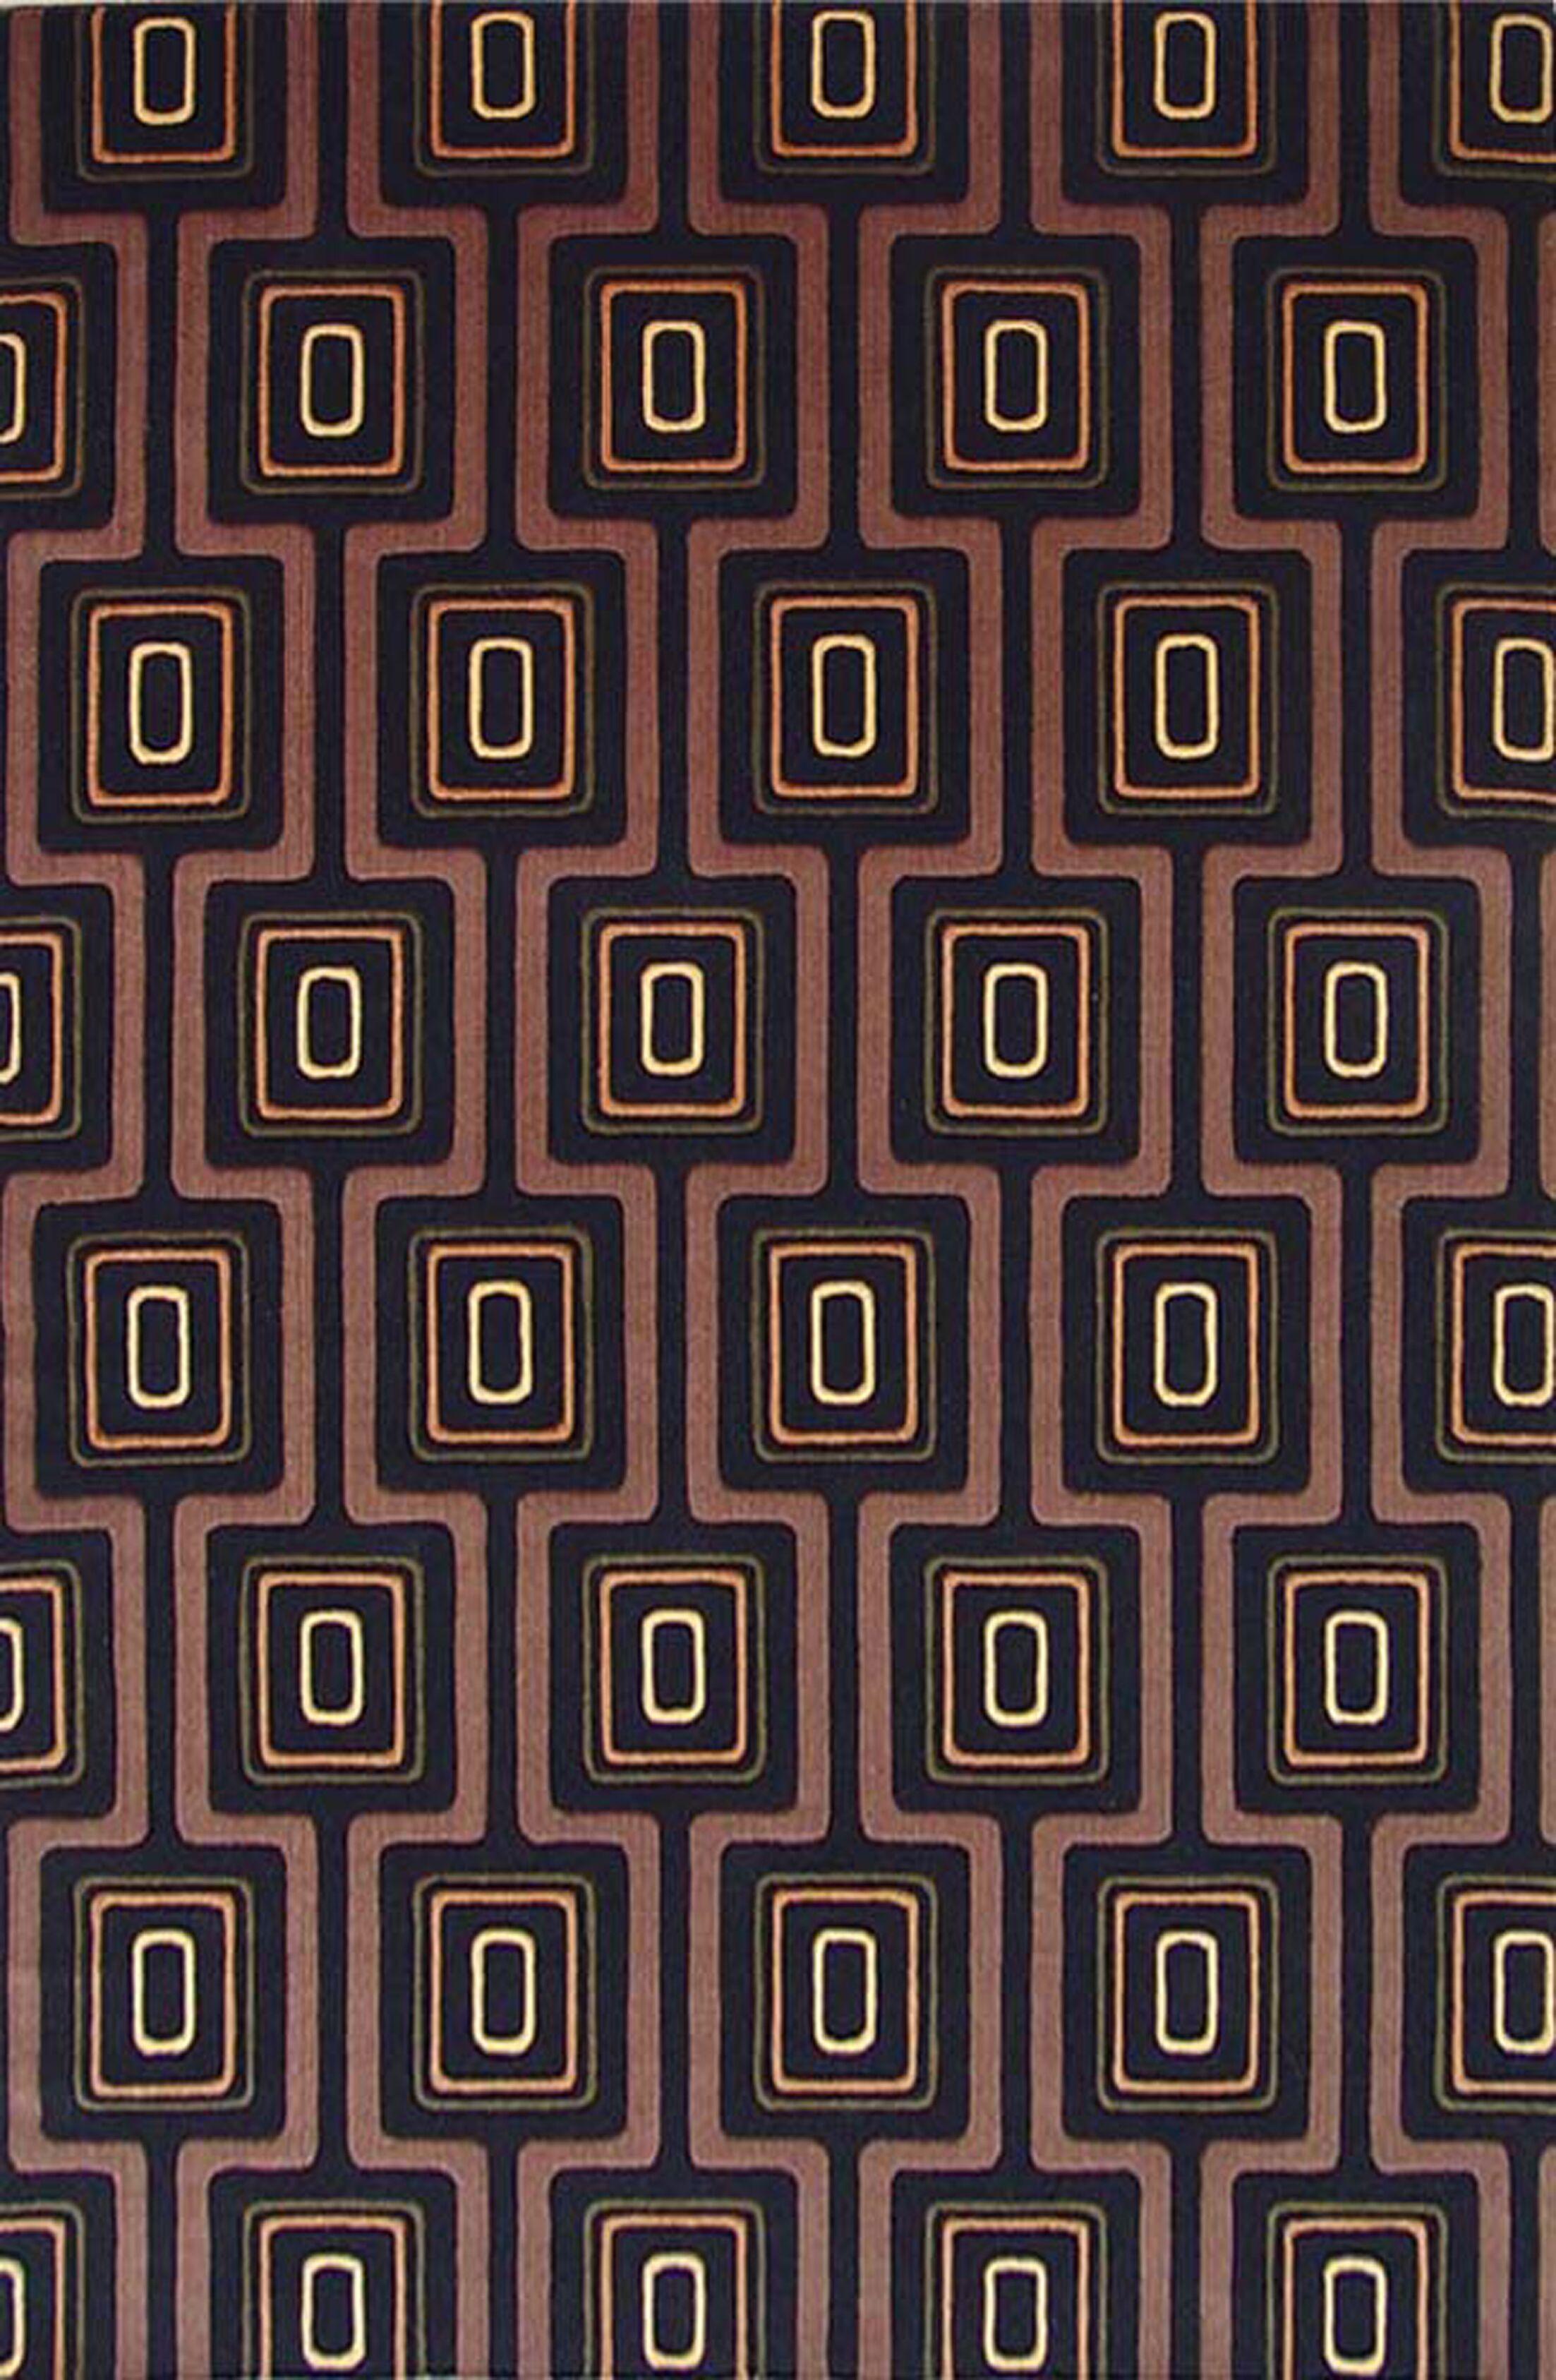 Geno Black City Grid Contemporary Rug Rug Size: Runner 2'6